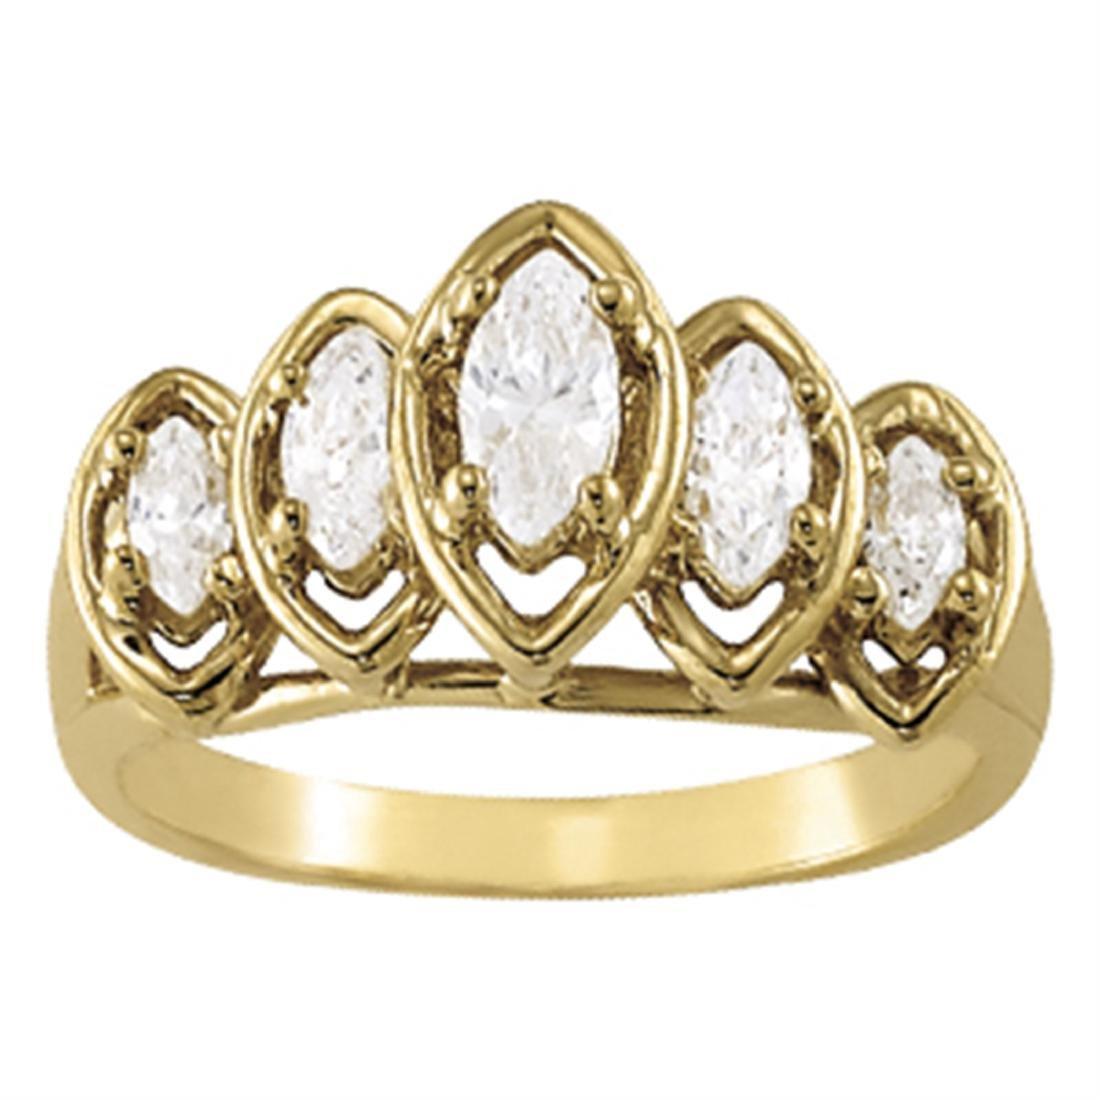 14kt gold 3.52 gram Wedding Bands/Fancy Shape/Marquise